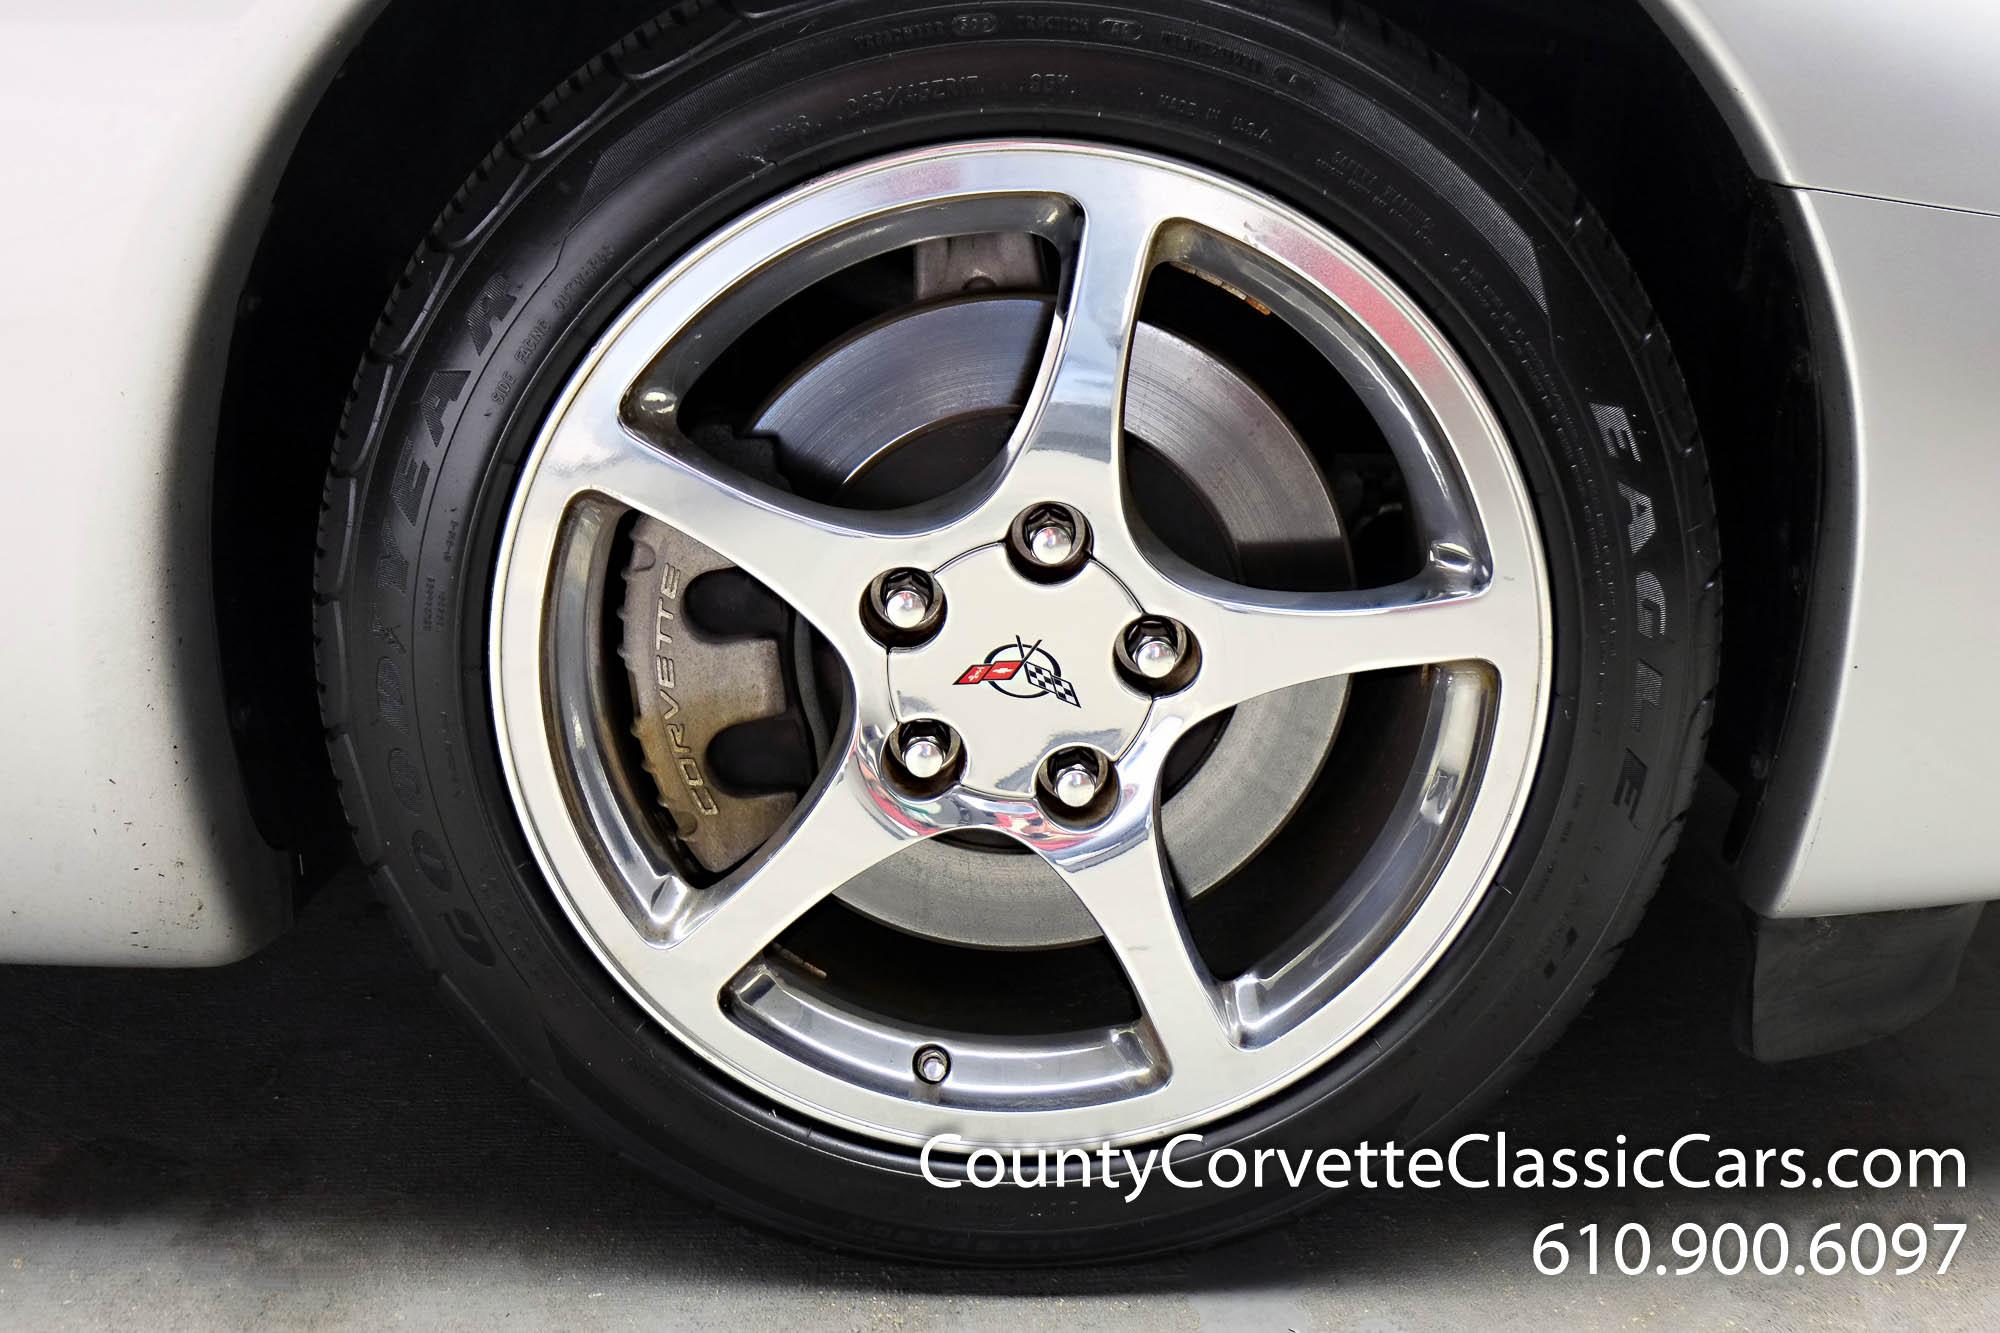 2002-Corvette-Coupe-20.jpg